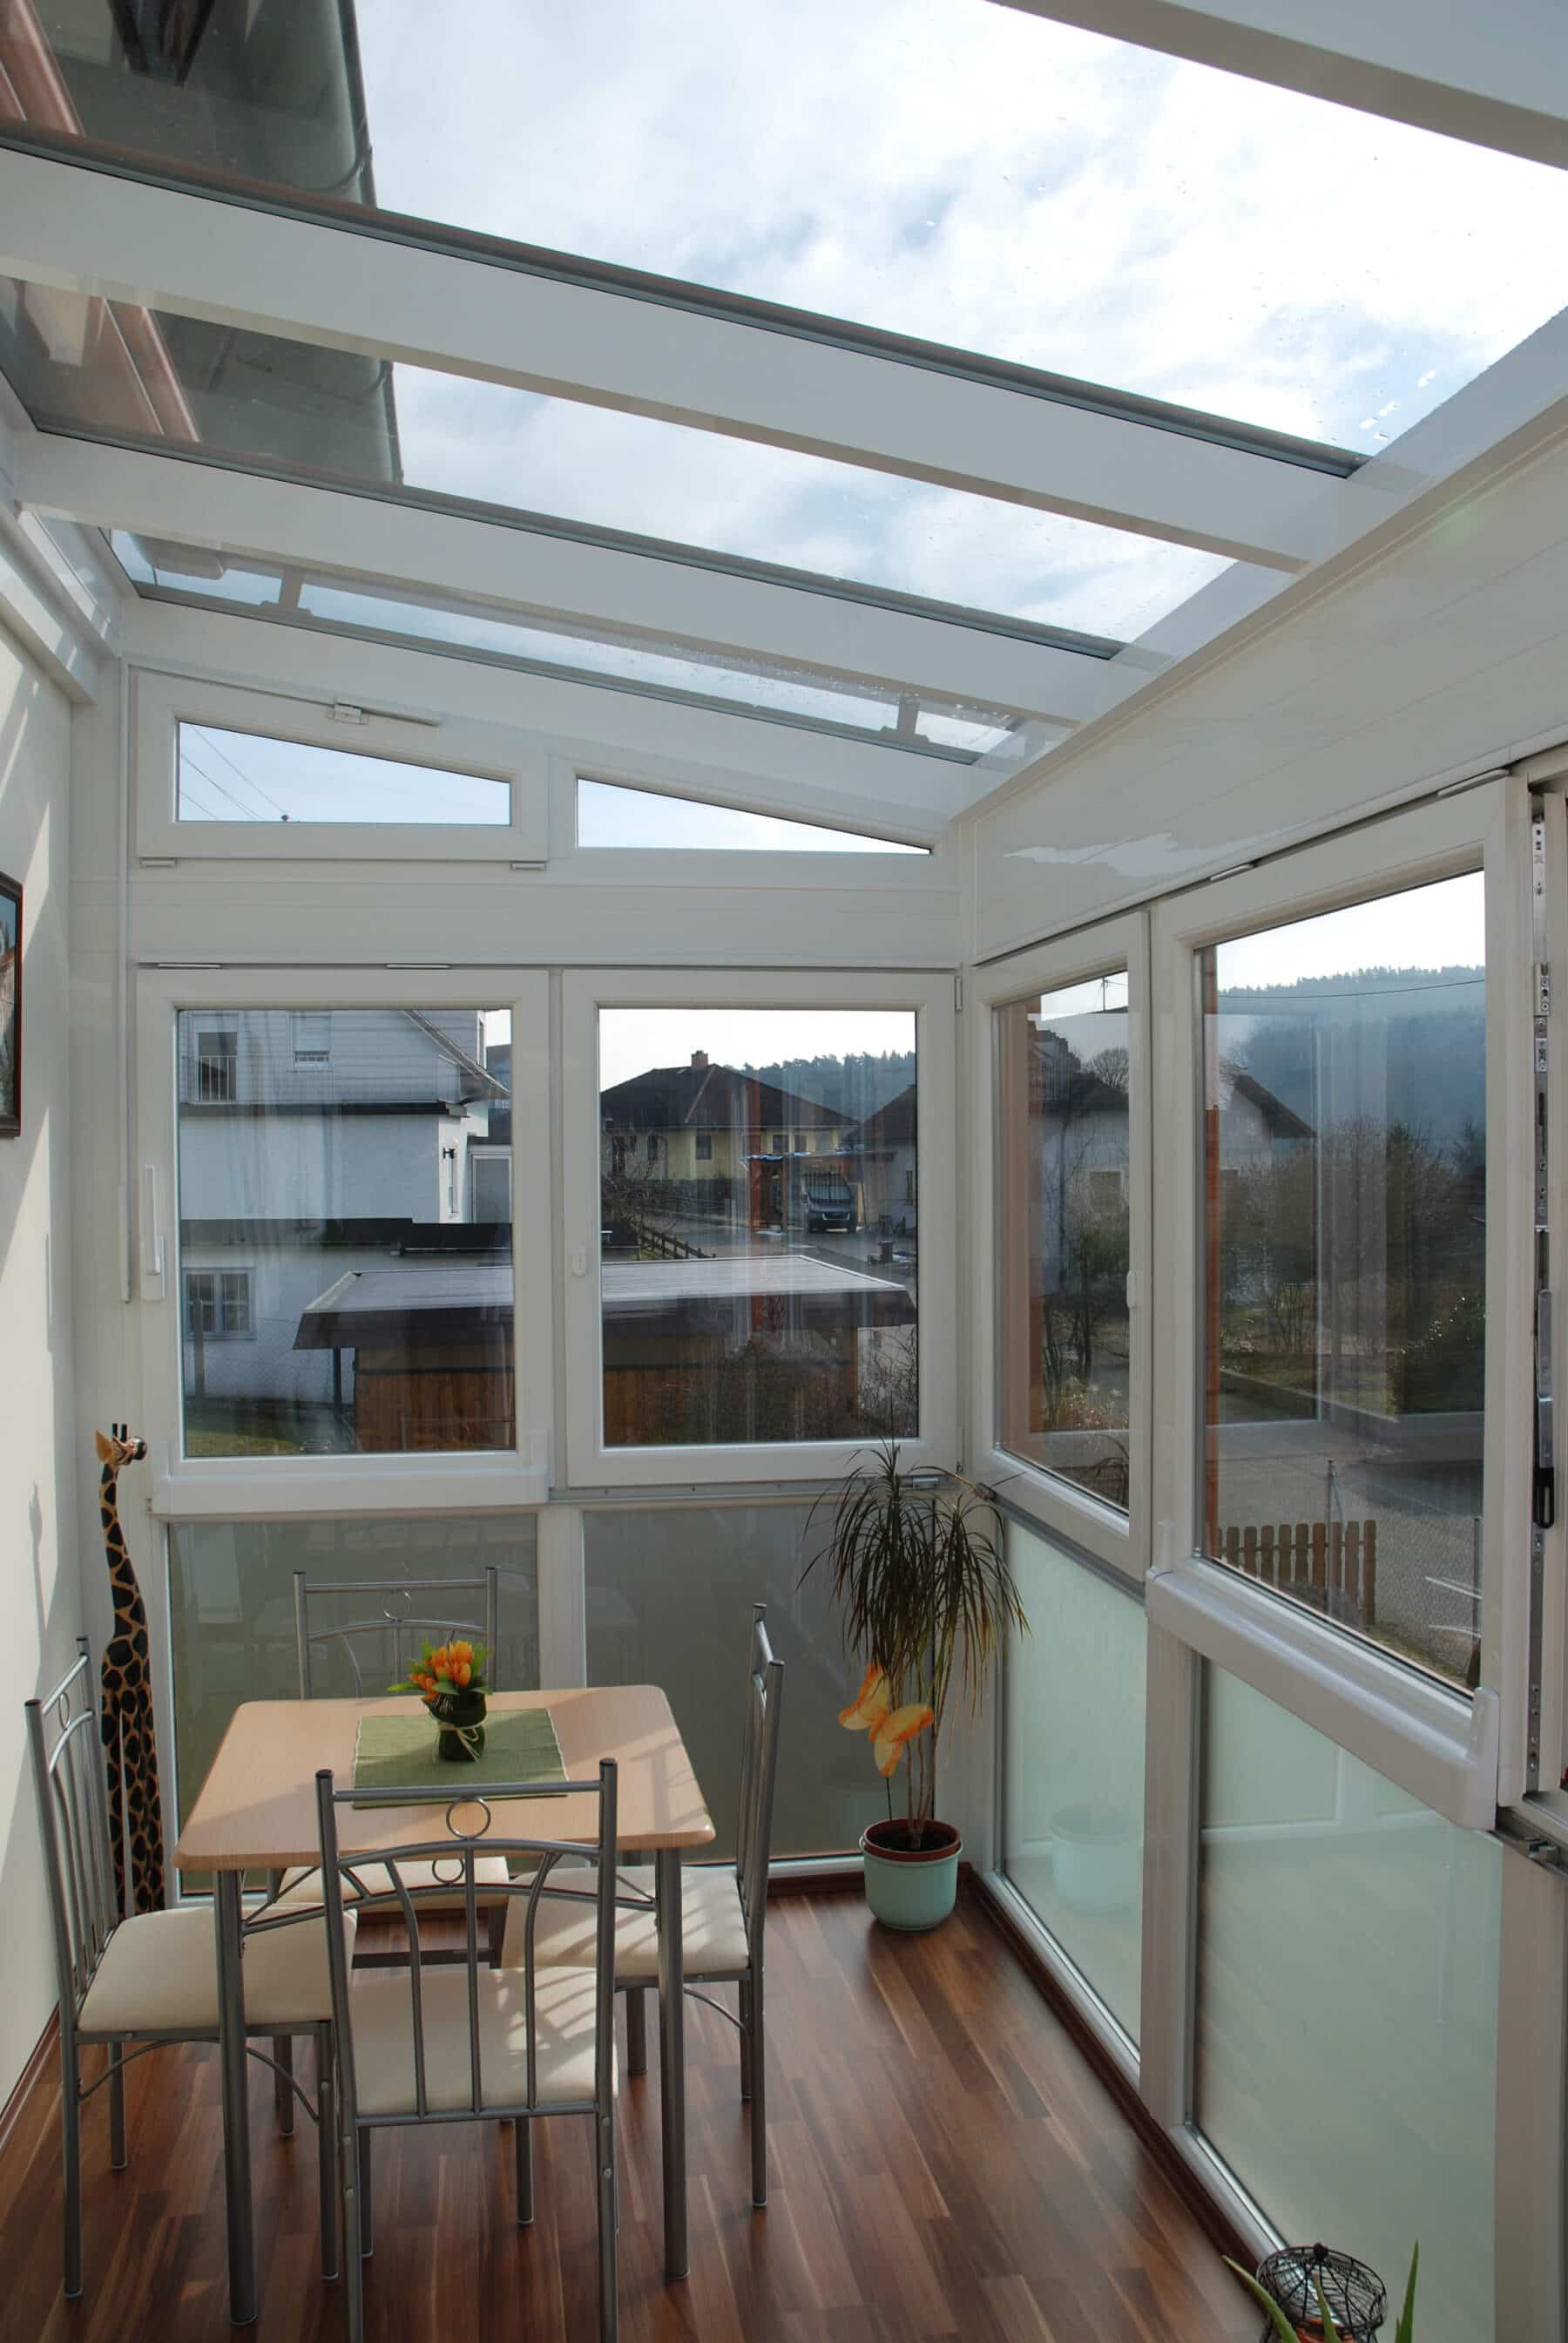 Kunststoff-Wintergarten mit Aluminium-Dachsparren